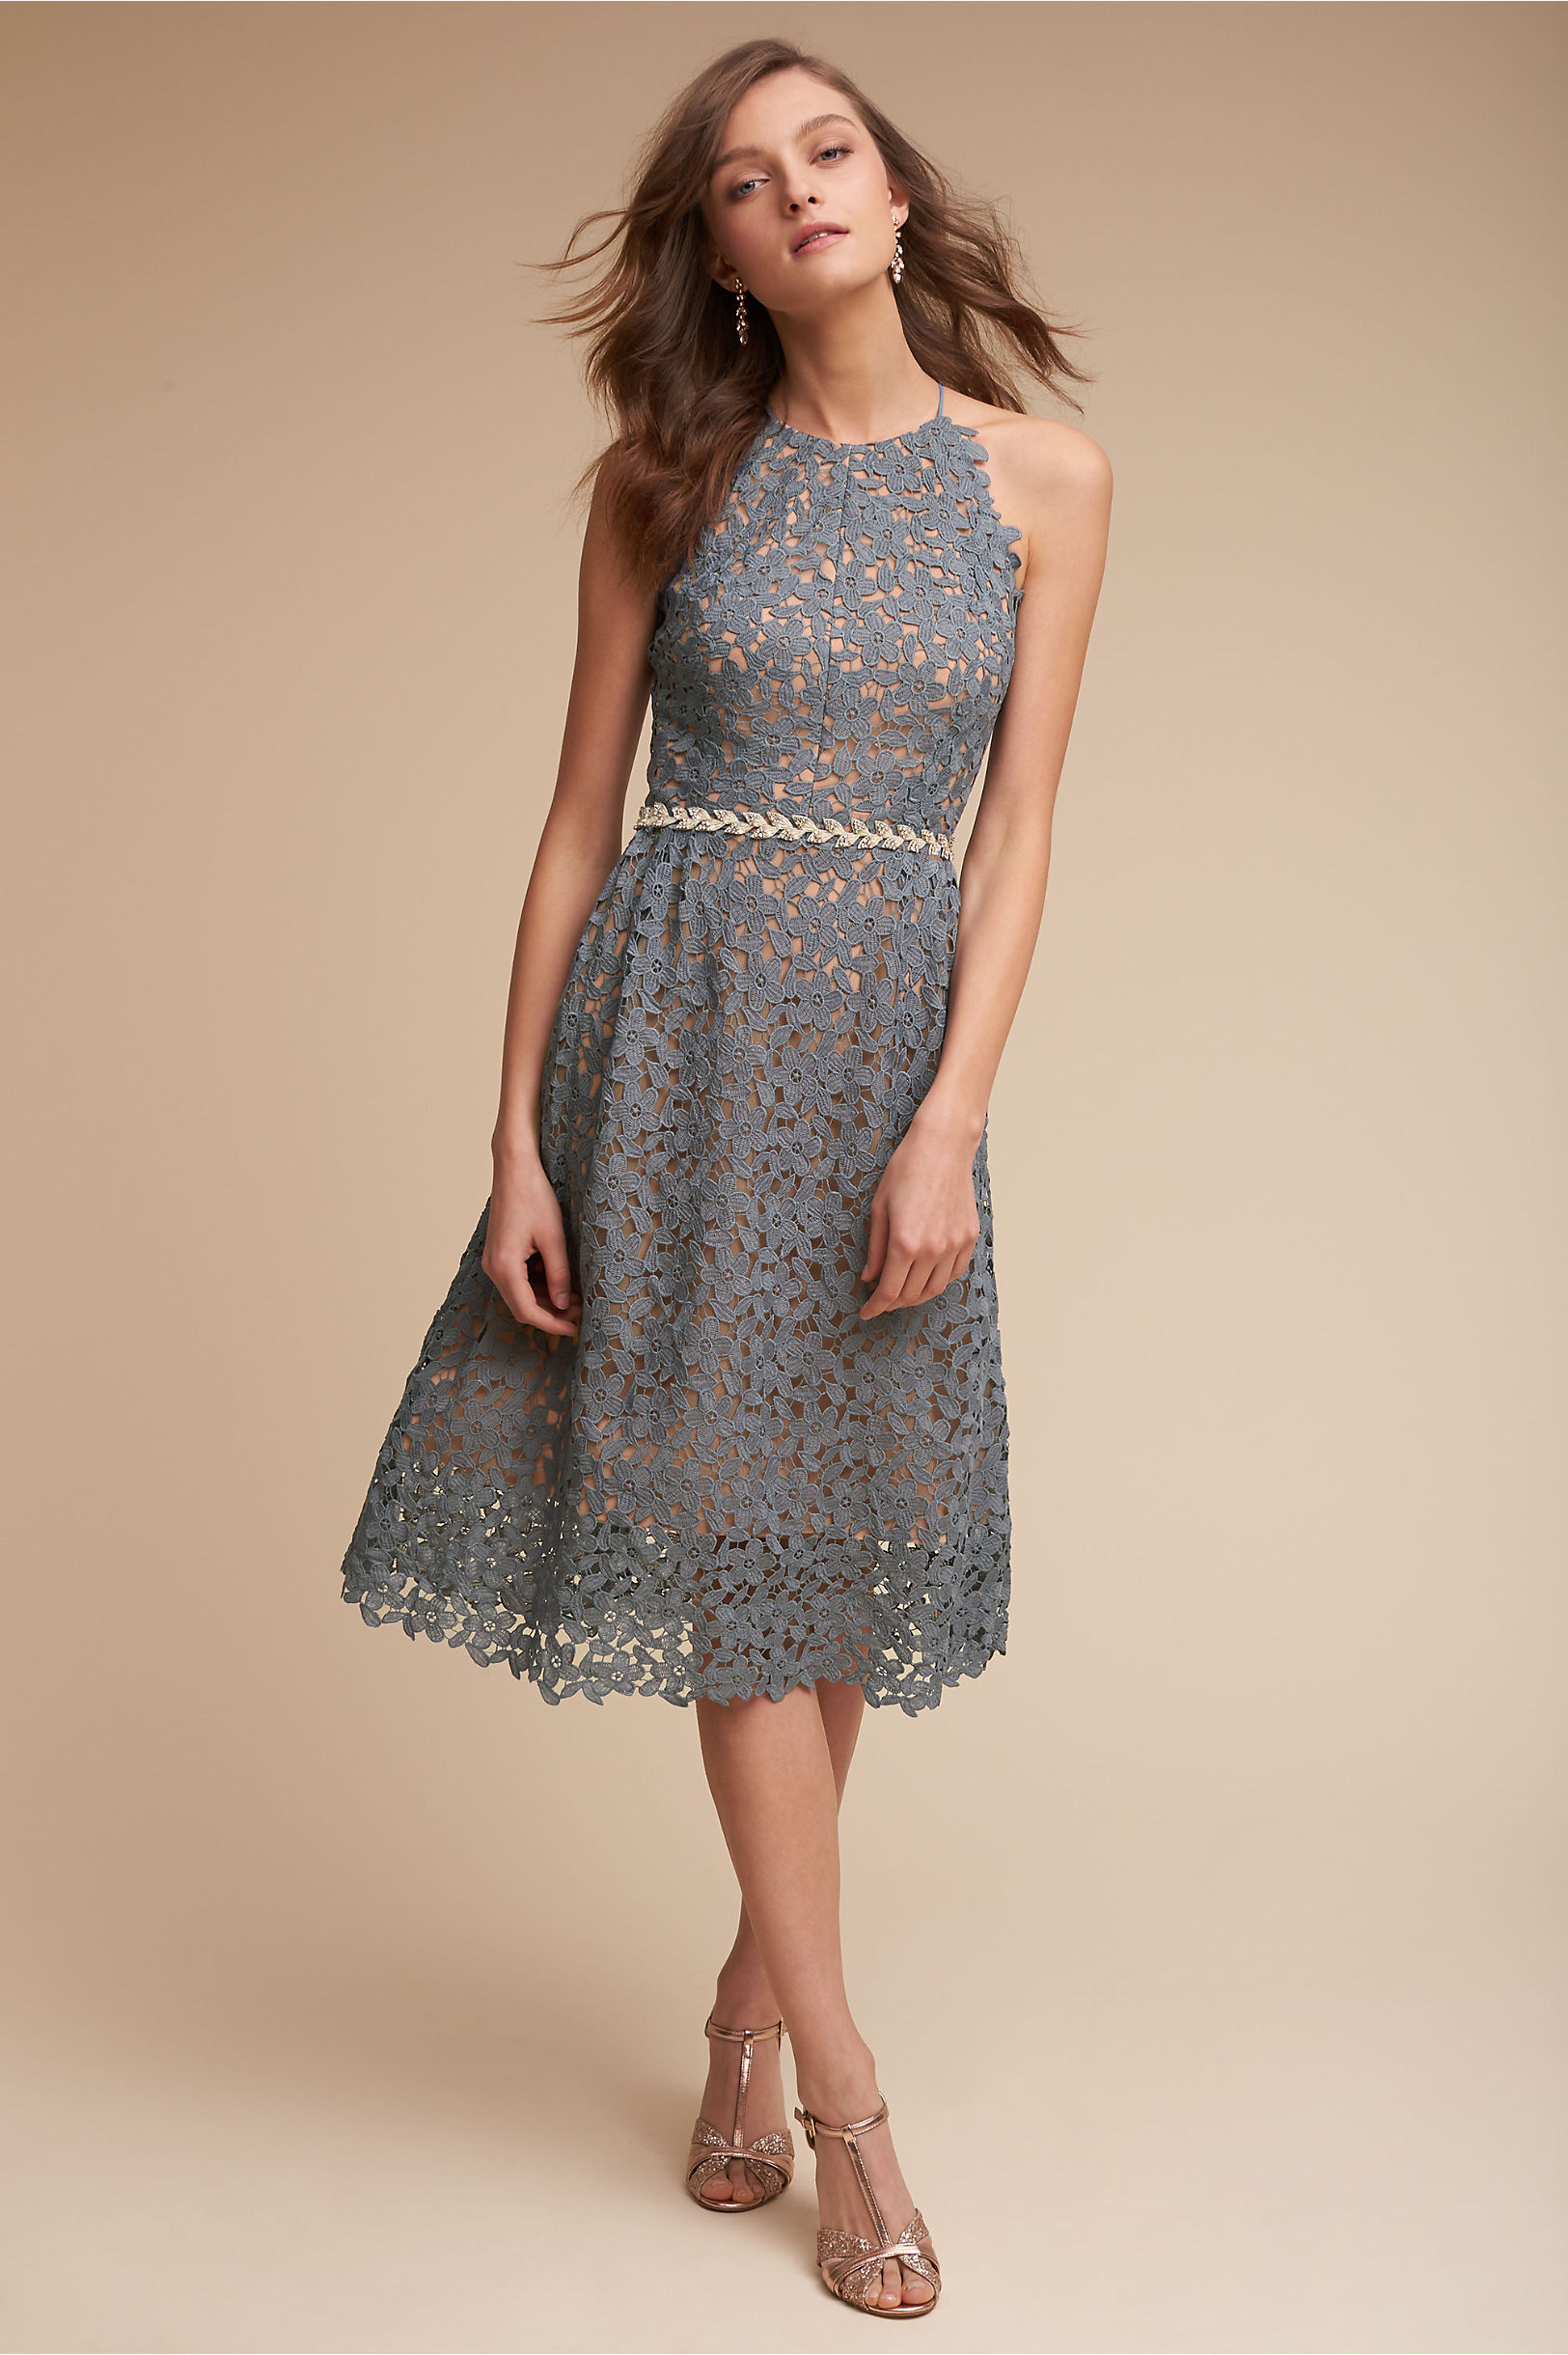 Short Bridesmaid Dresses  Tea Length & Chiffon  BHLDN